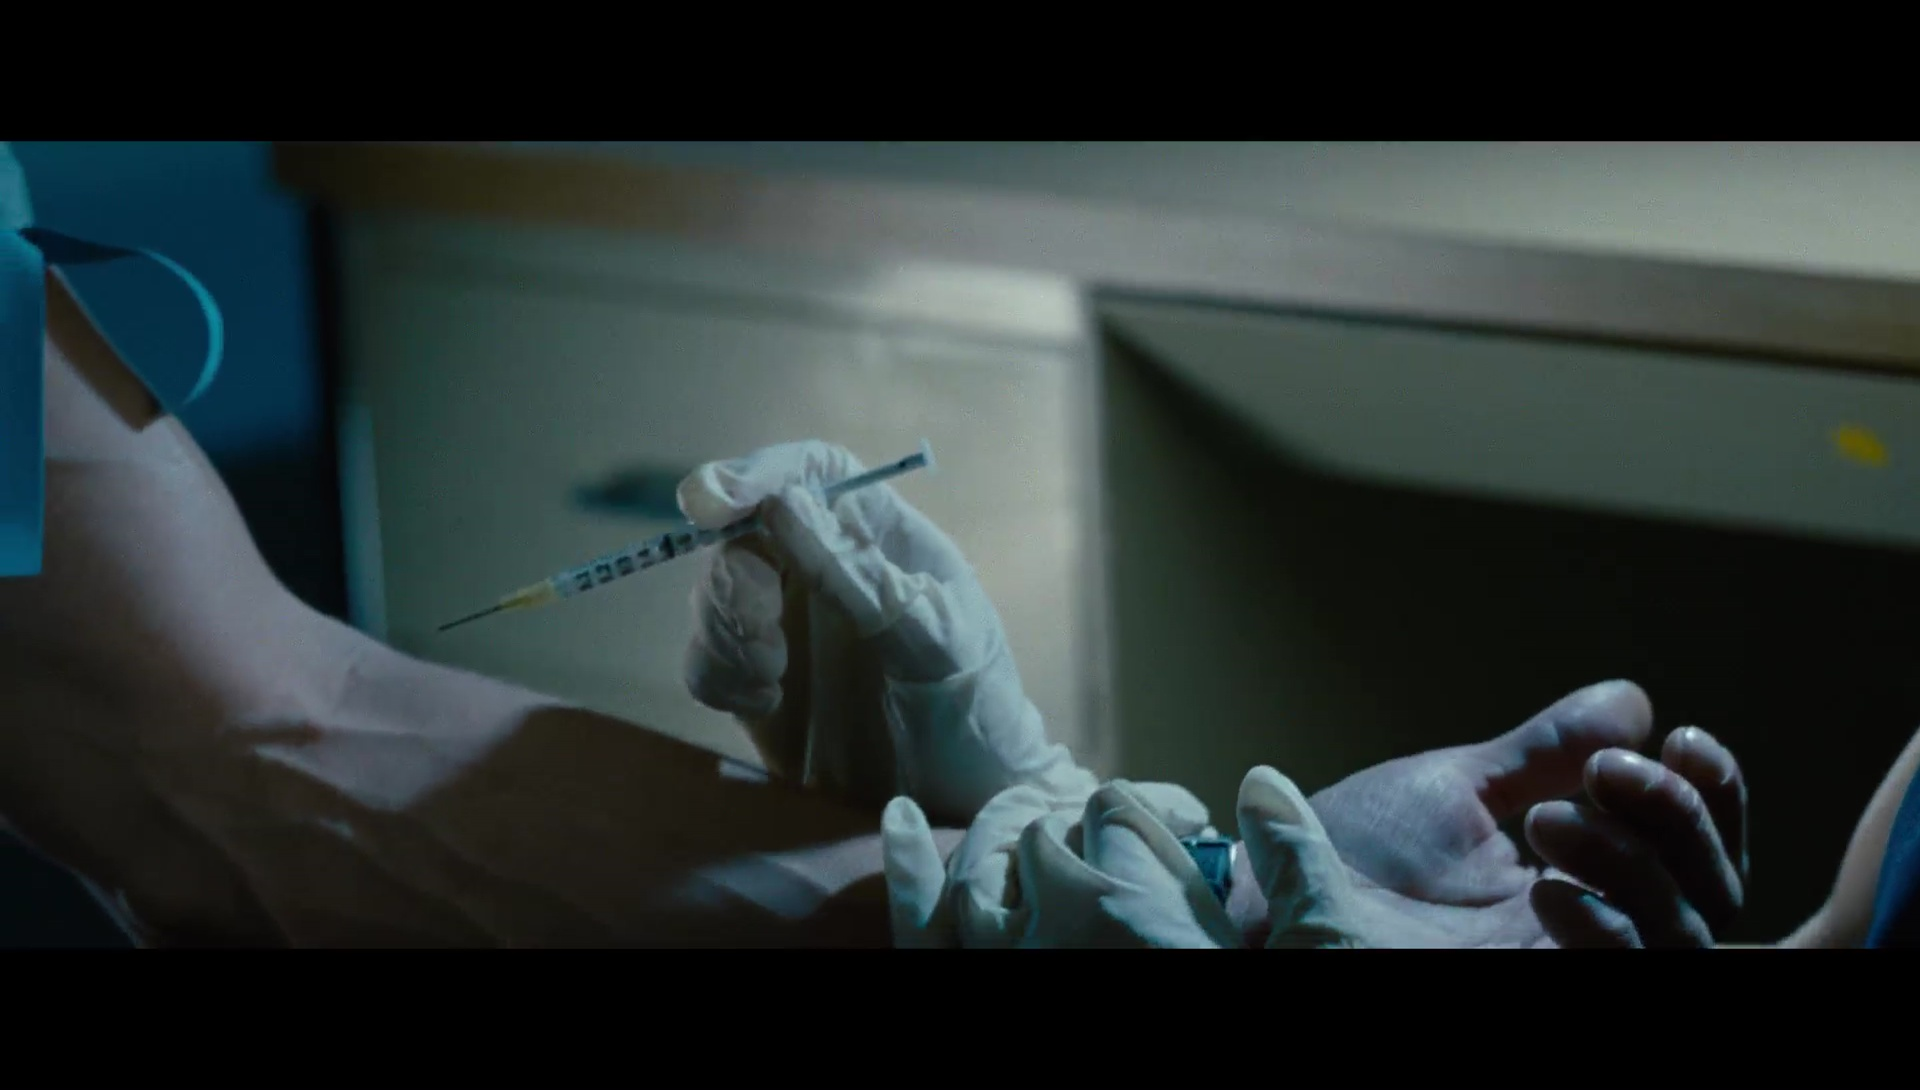 El Legado Bourne 1080p Lat-Cast-Ing 5.1 (2012)